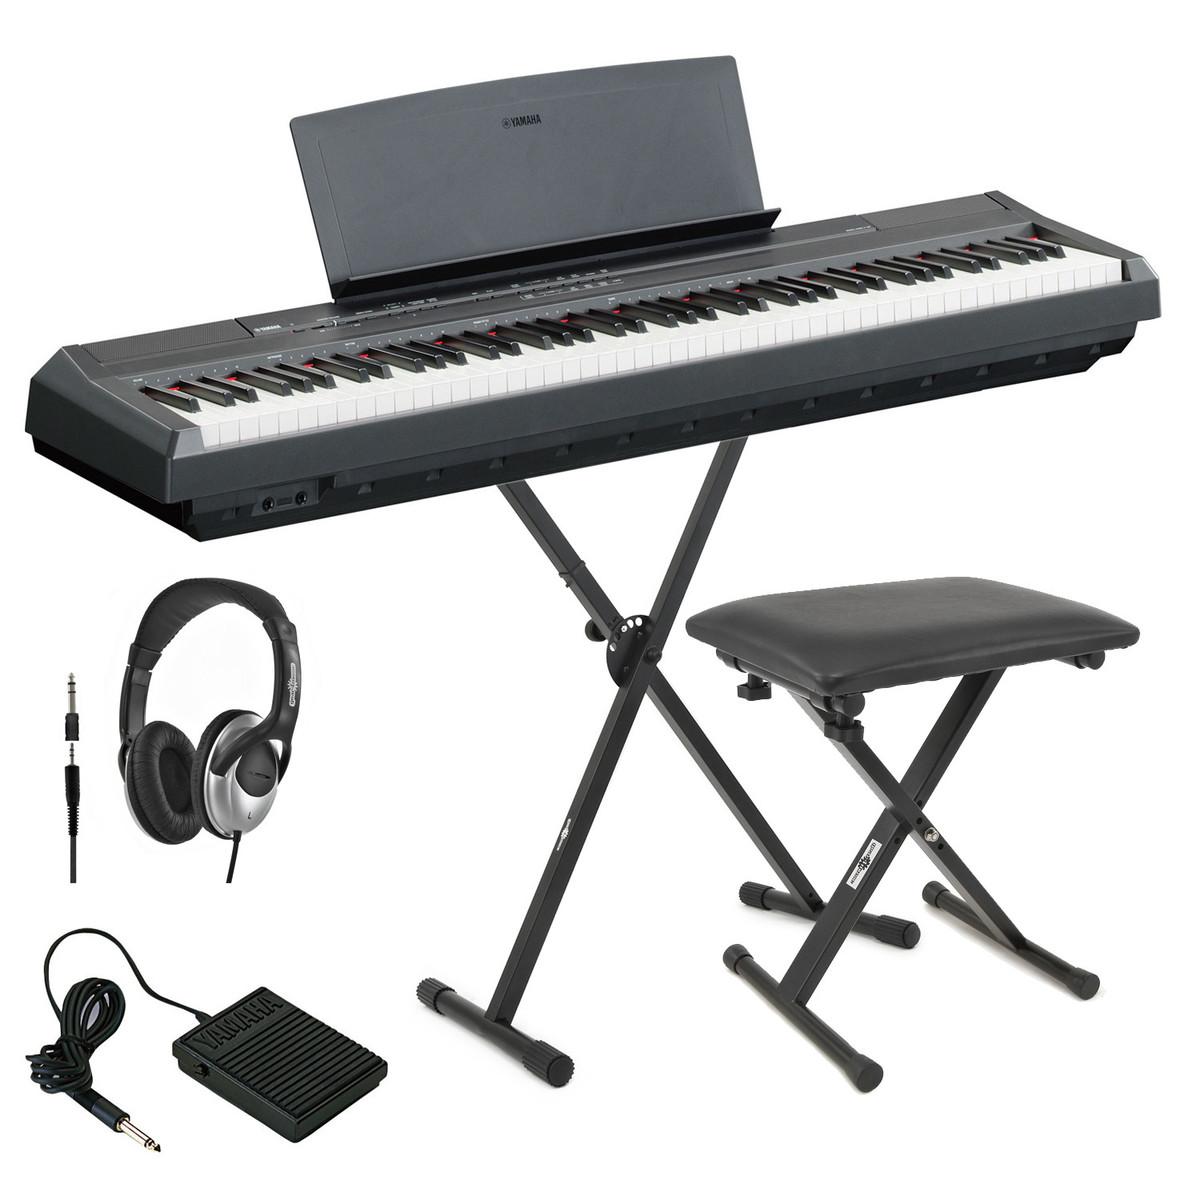 discyamaha p105 digital piano black inc stand bench headphones op. Black Bedroom Furniture Sets. Home Design Ideas